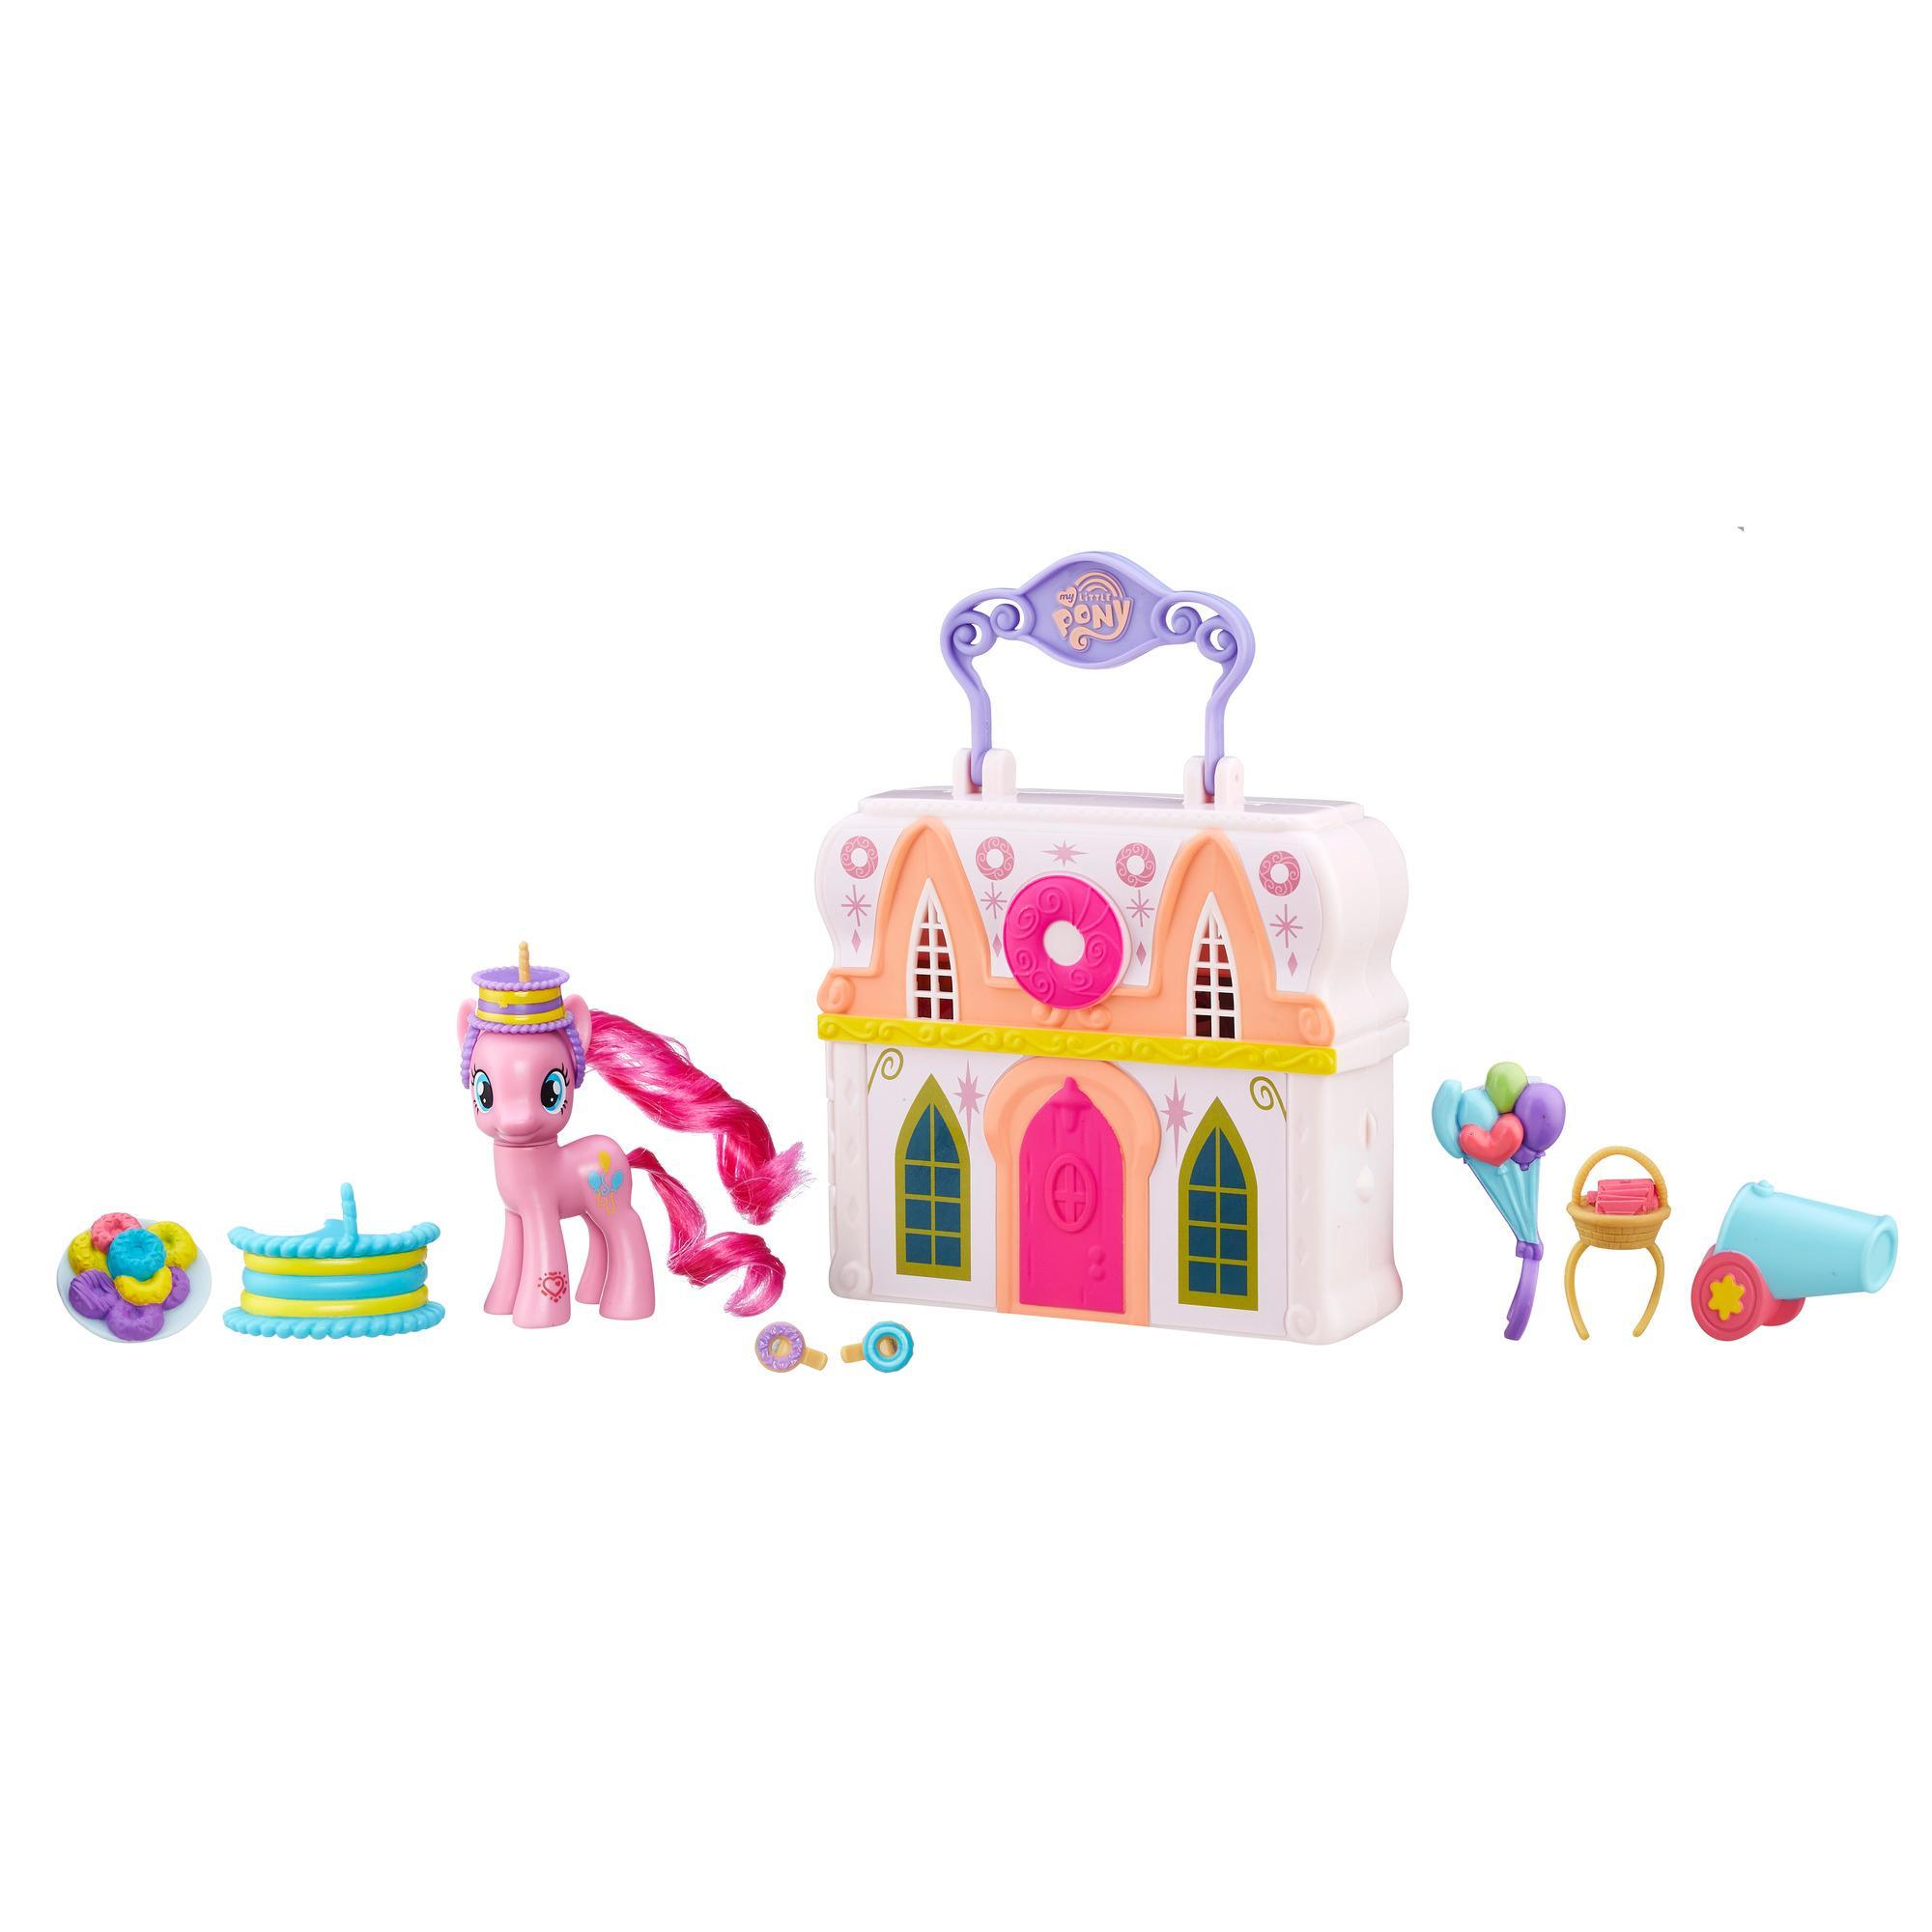 My Little Pony Friendship is Magic Pinkie Pie Donut Shop Playset